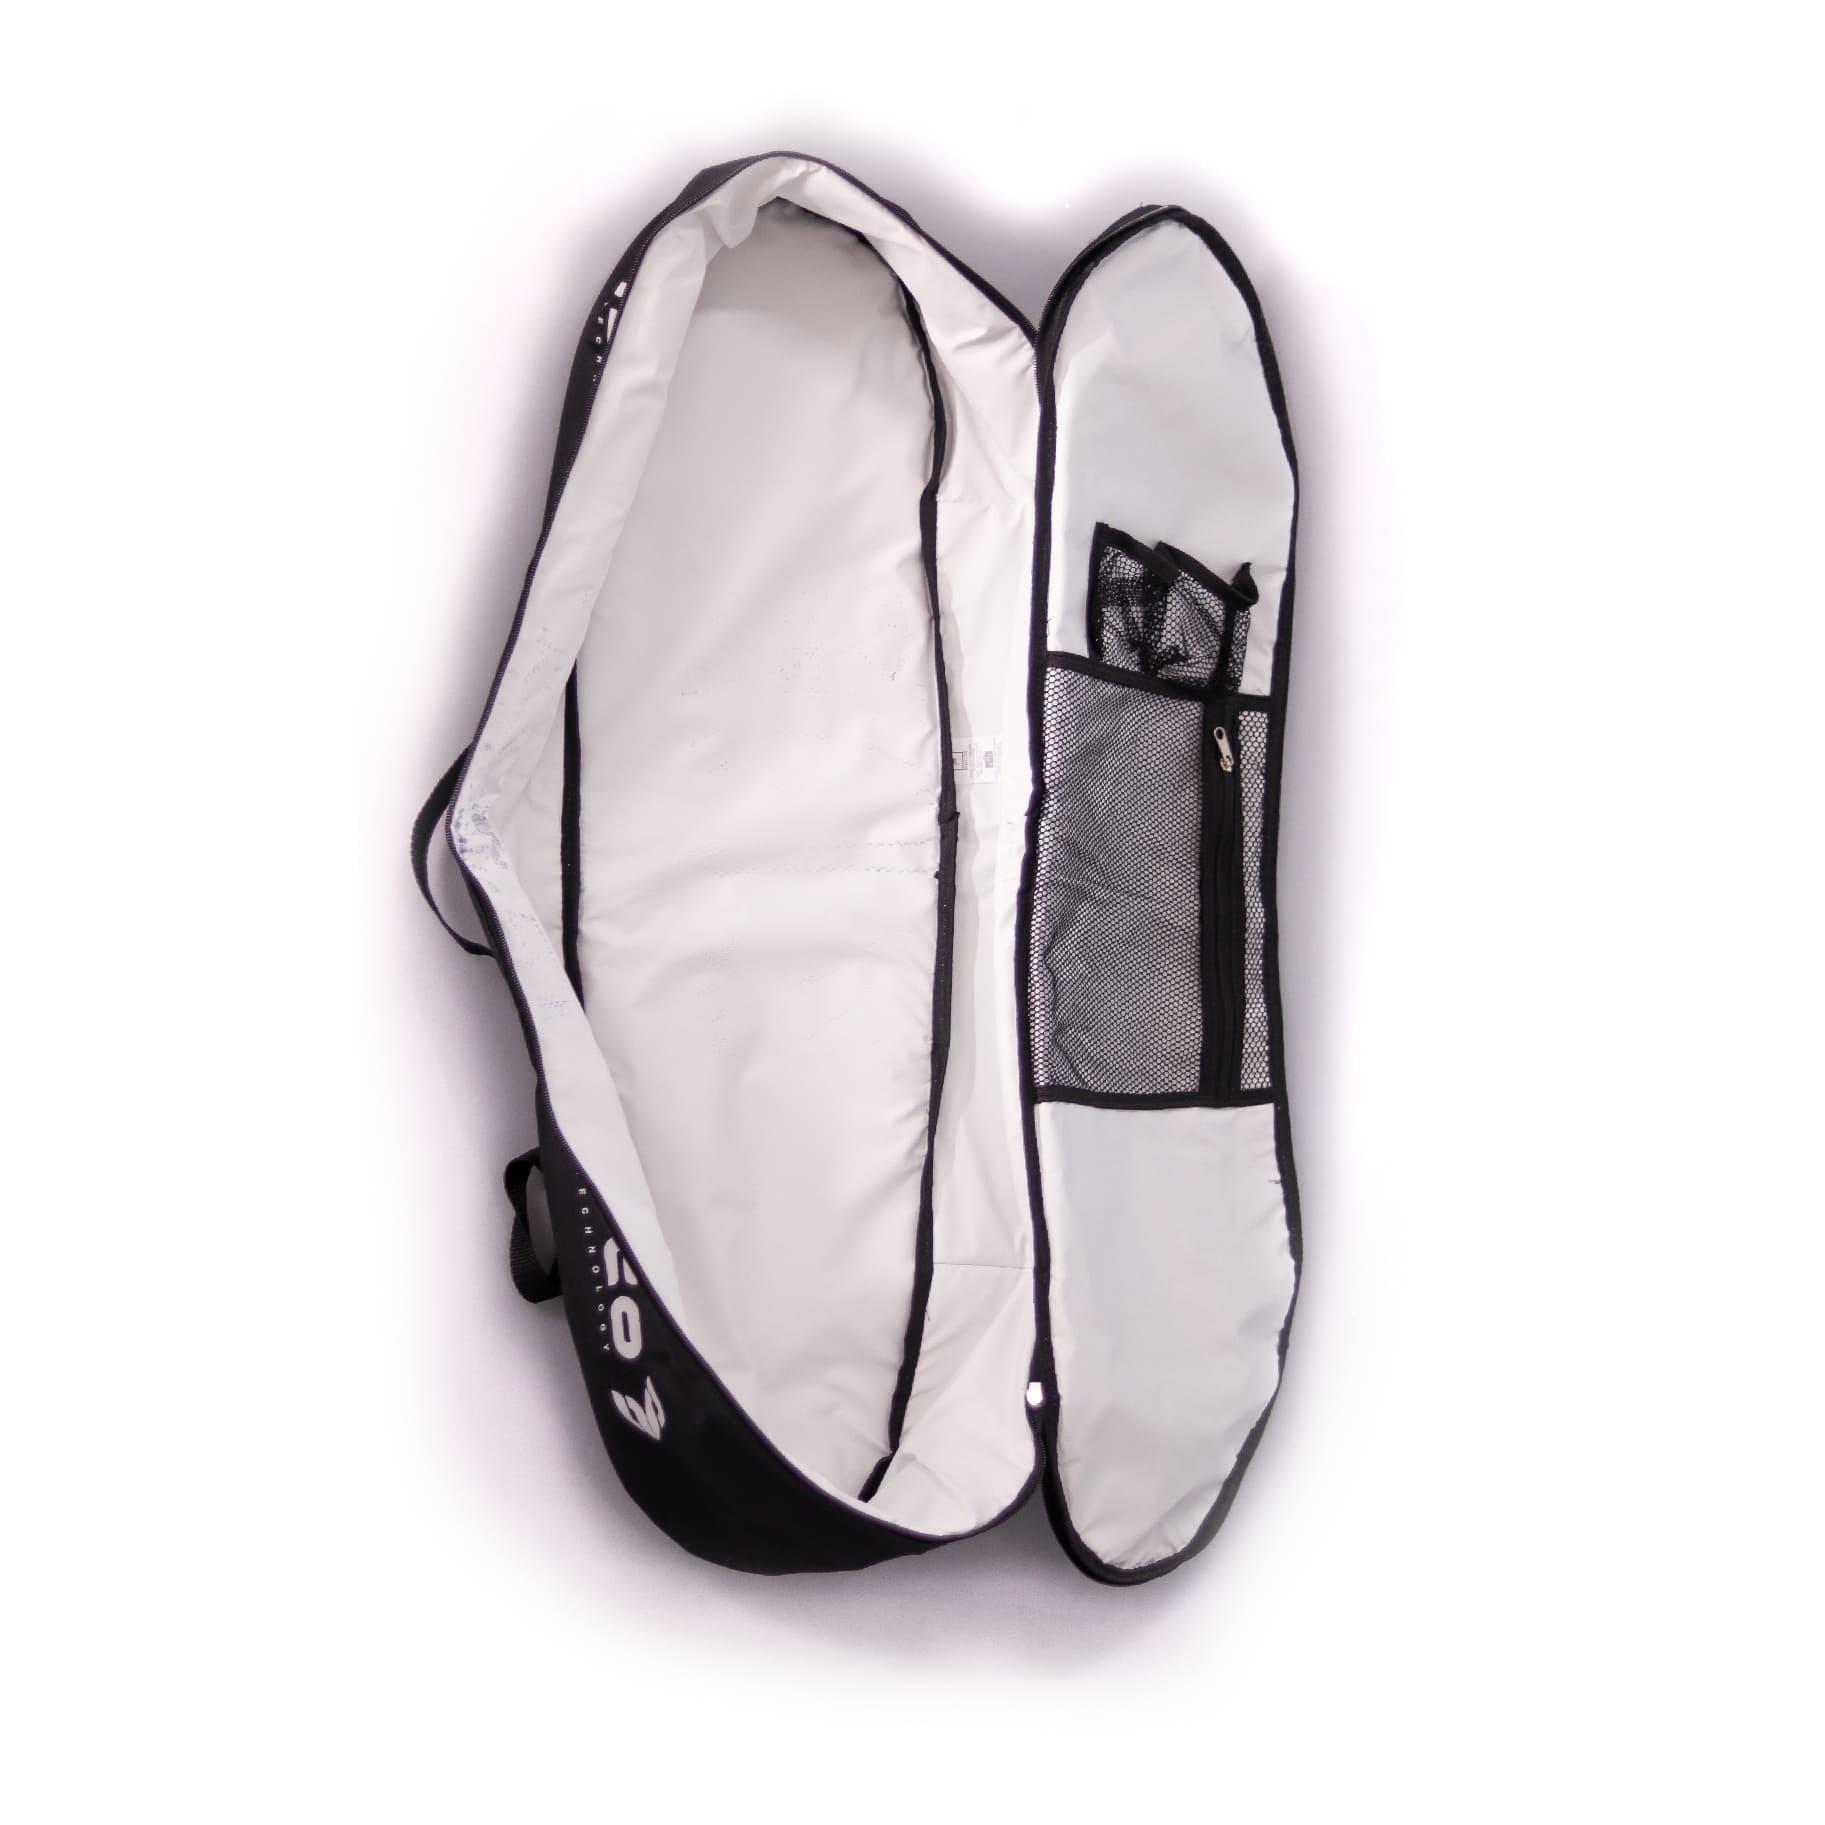 Skate Bag - Mochila Para Carregar Skate